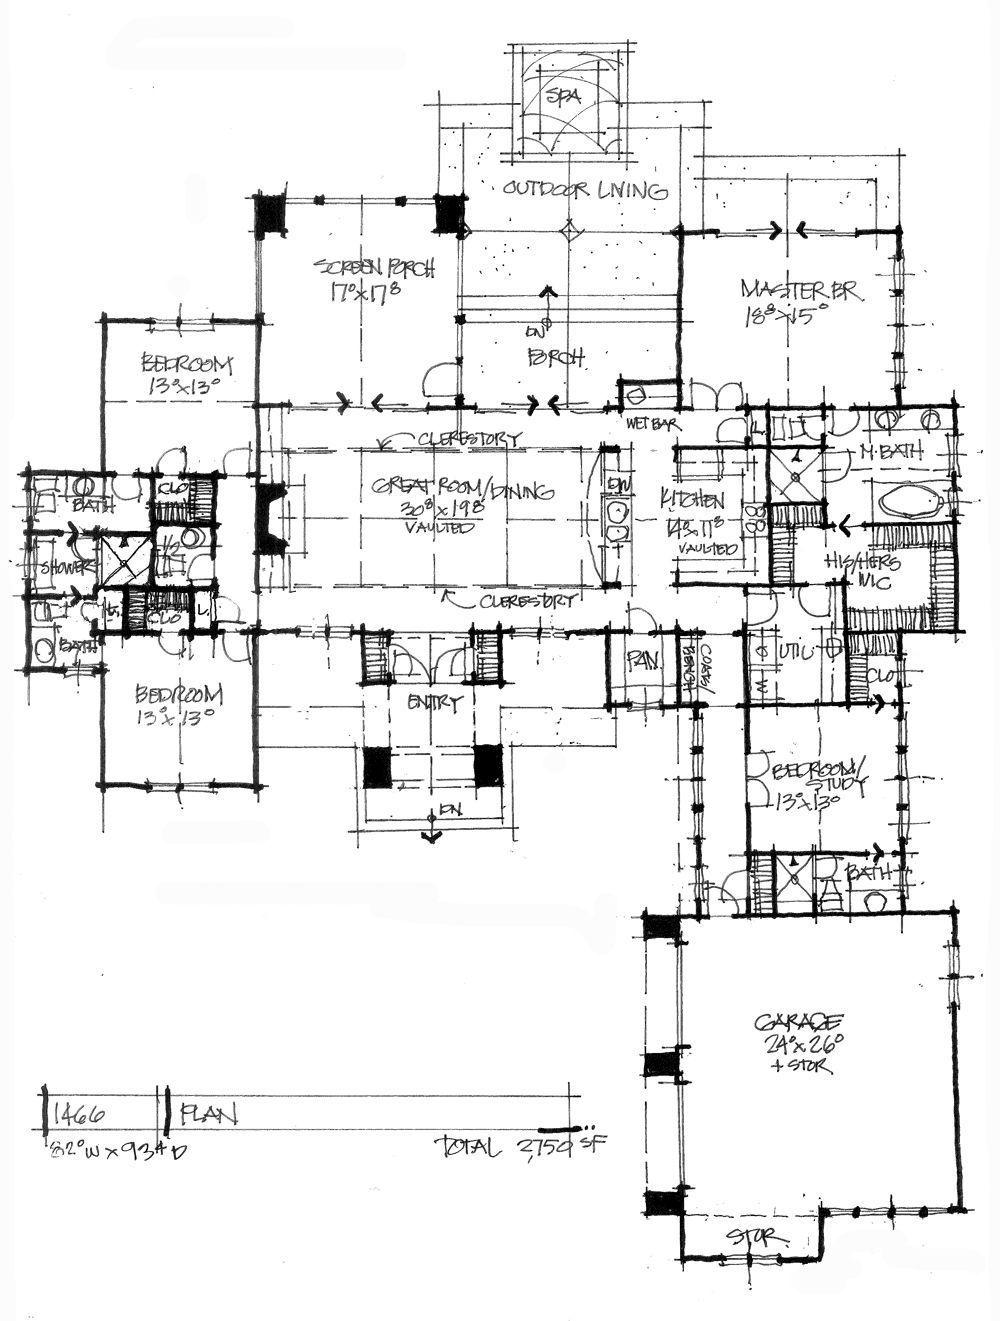 Beast Metal Building Barndominium Floor Plans And Design Ideas For You Kien Truc